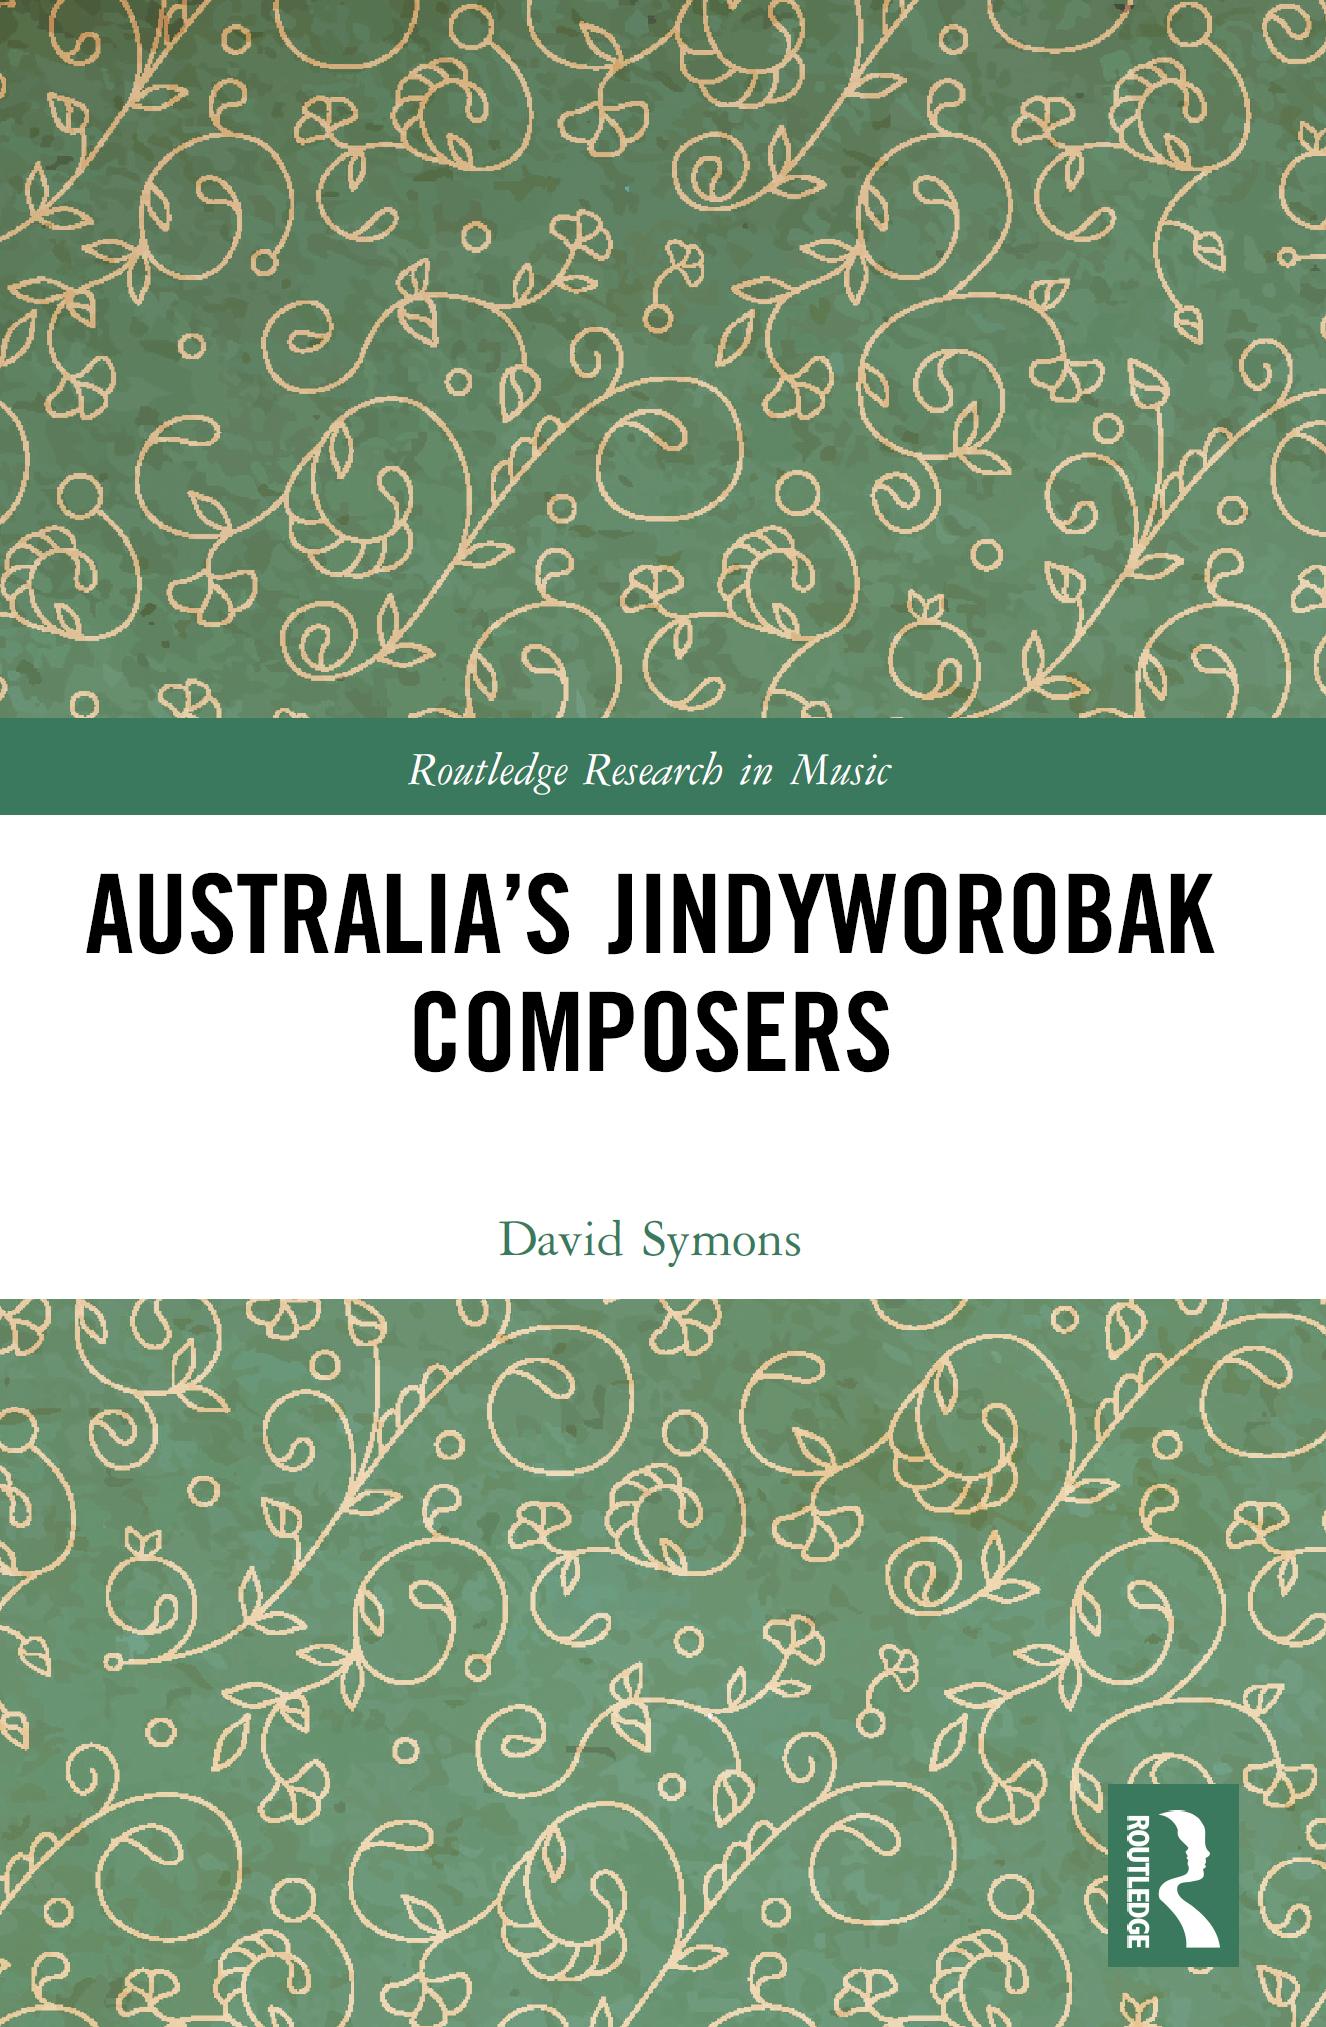 Australia's Jindyworobak Composers